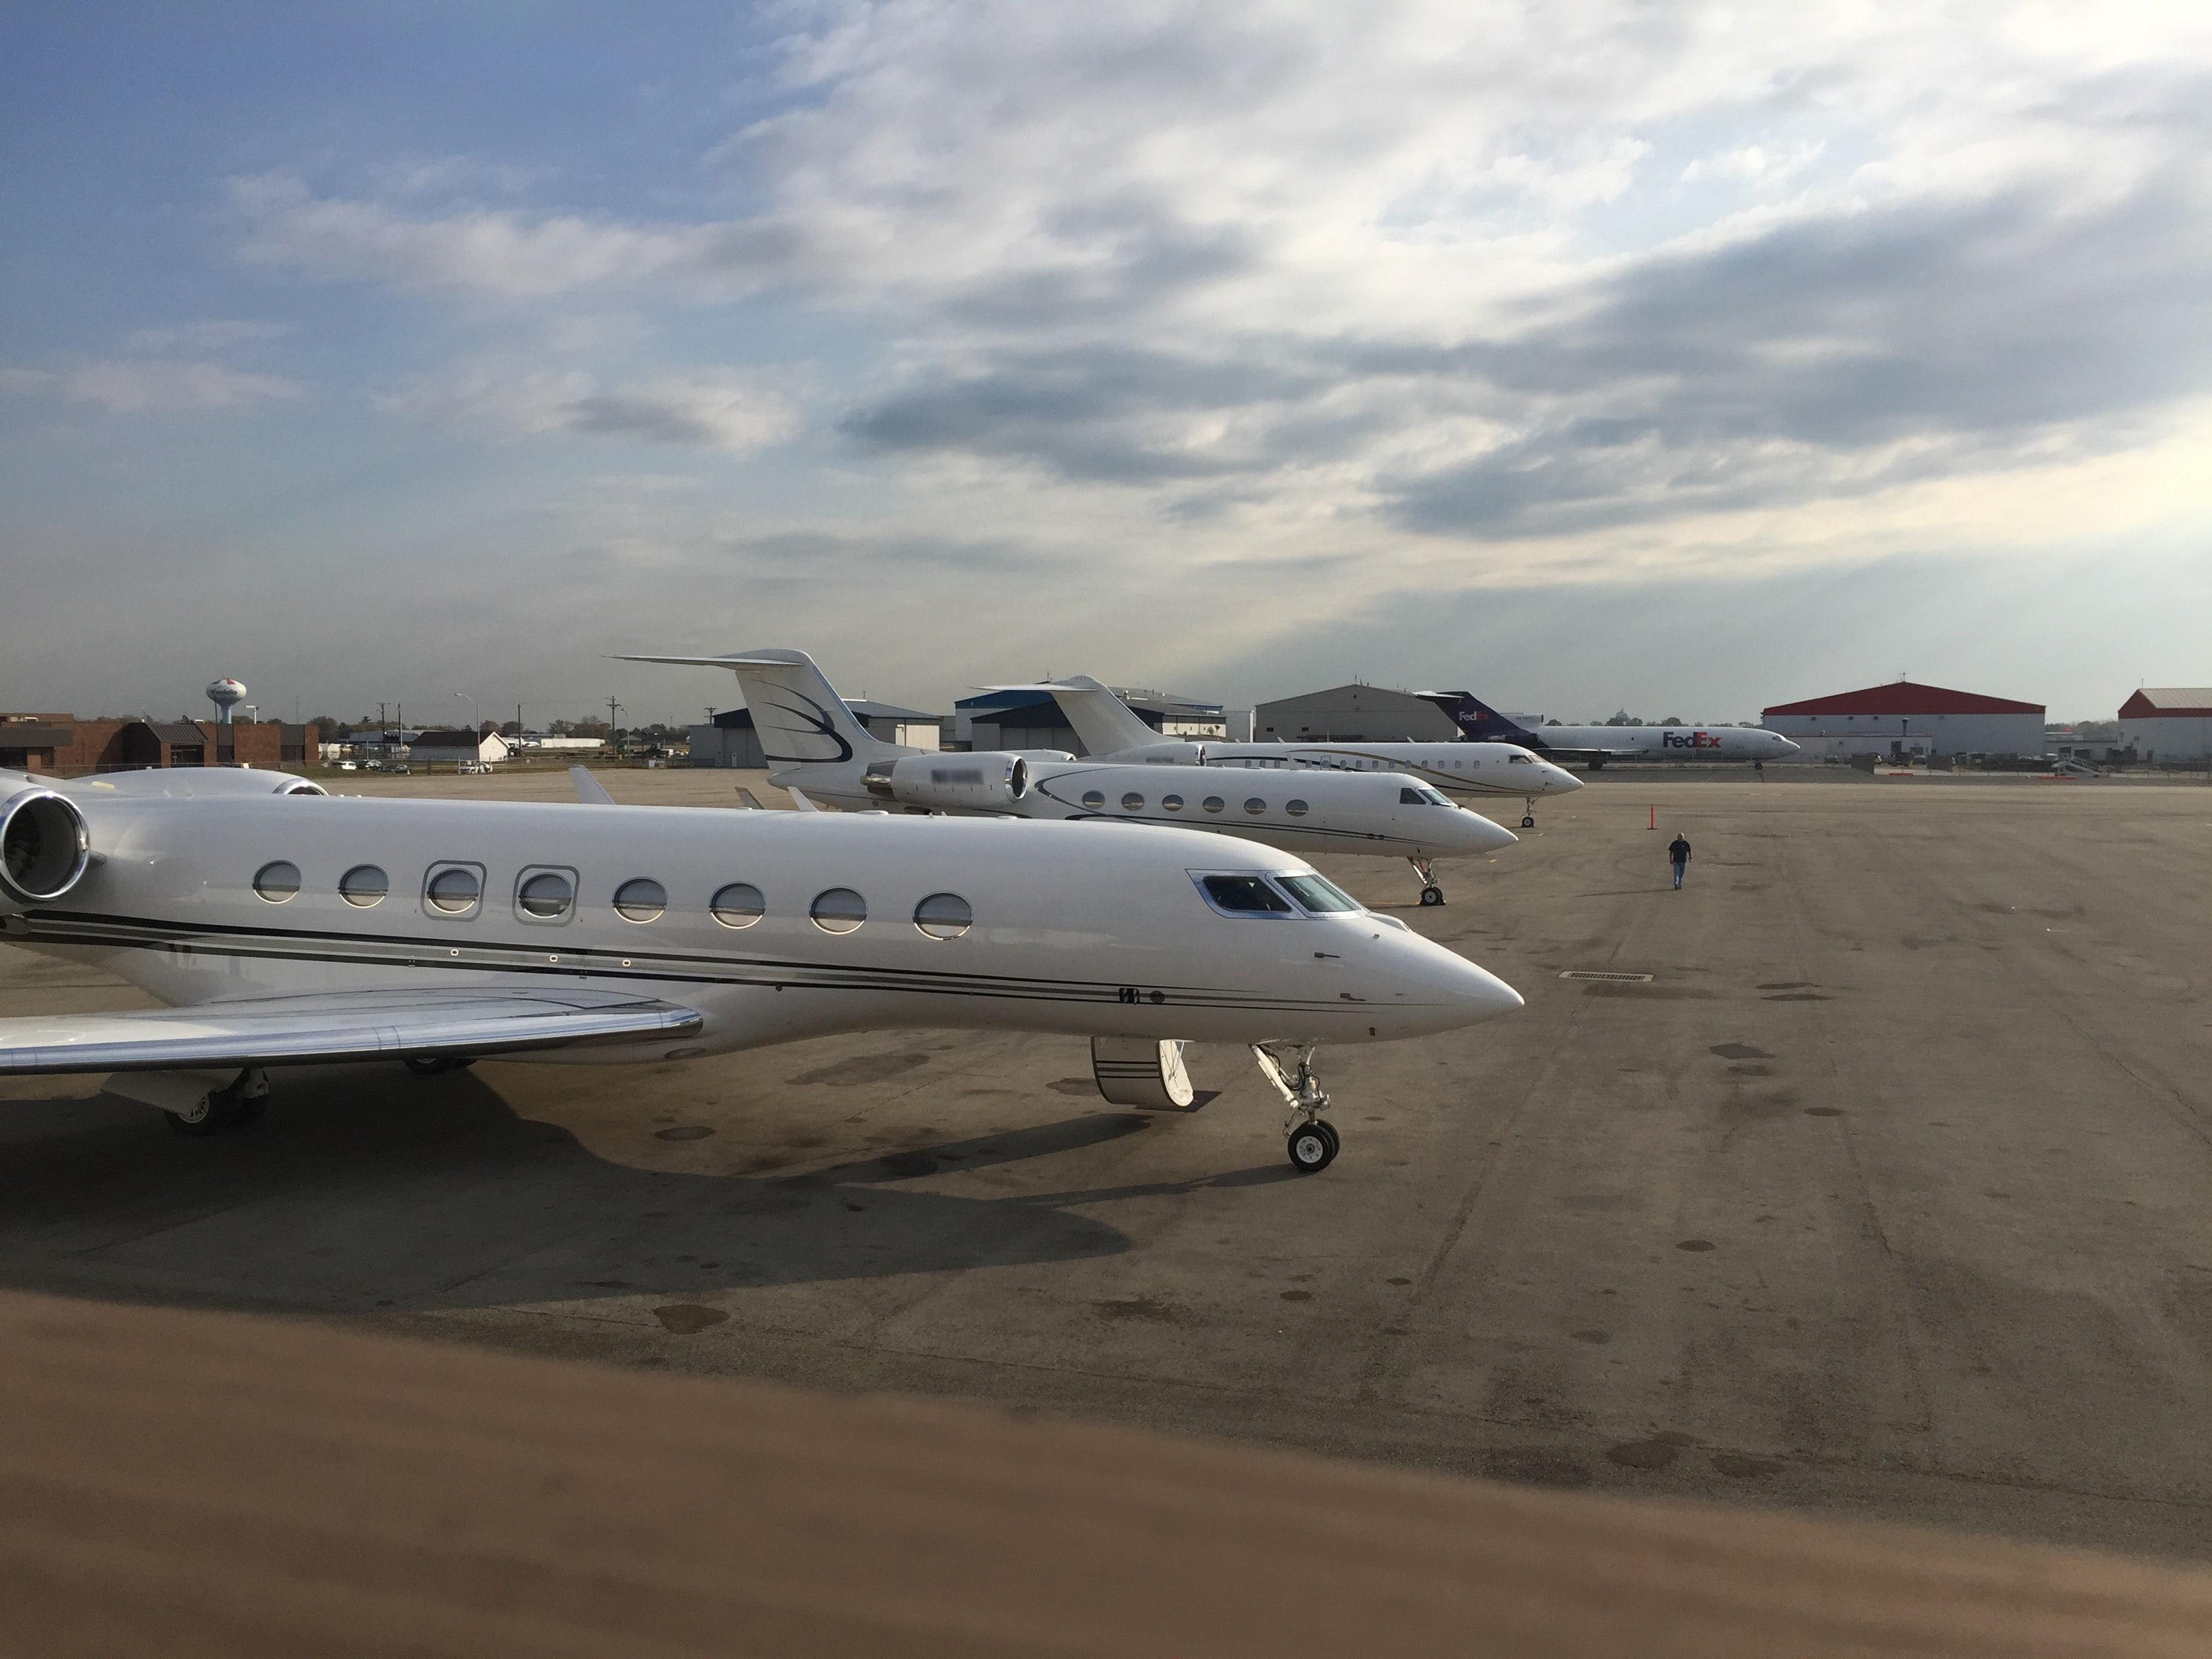 Fbo Services Wright Bros Aero Inc